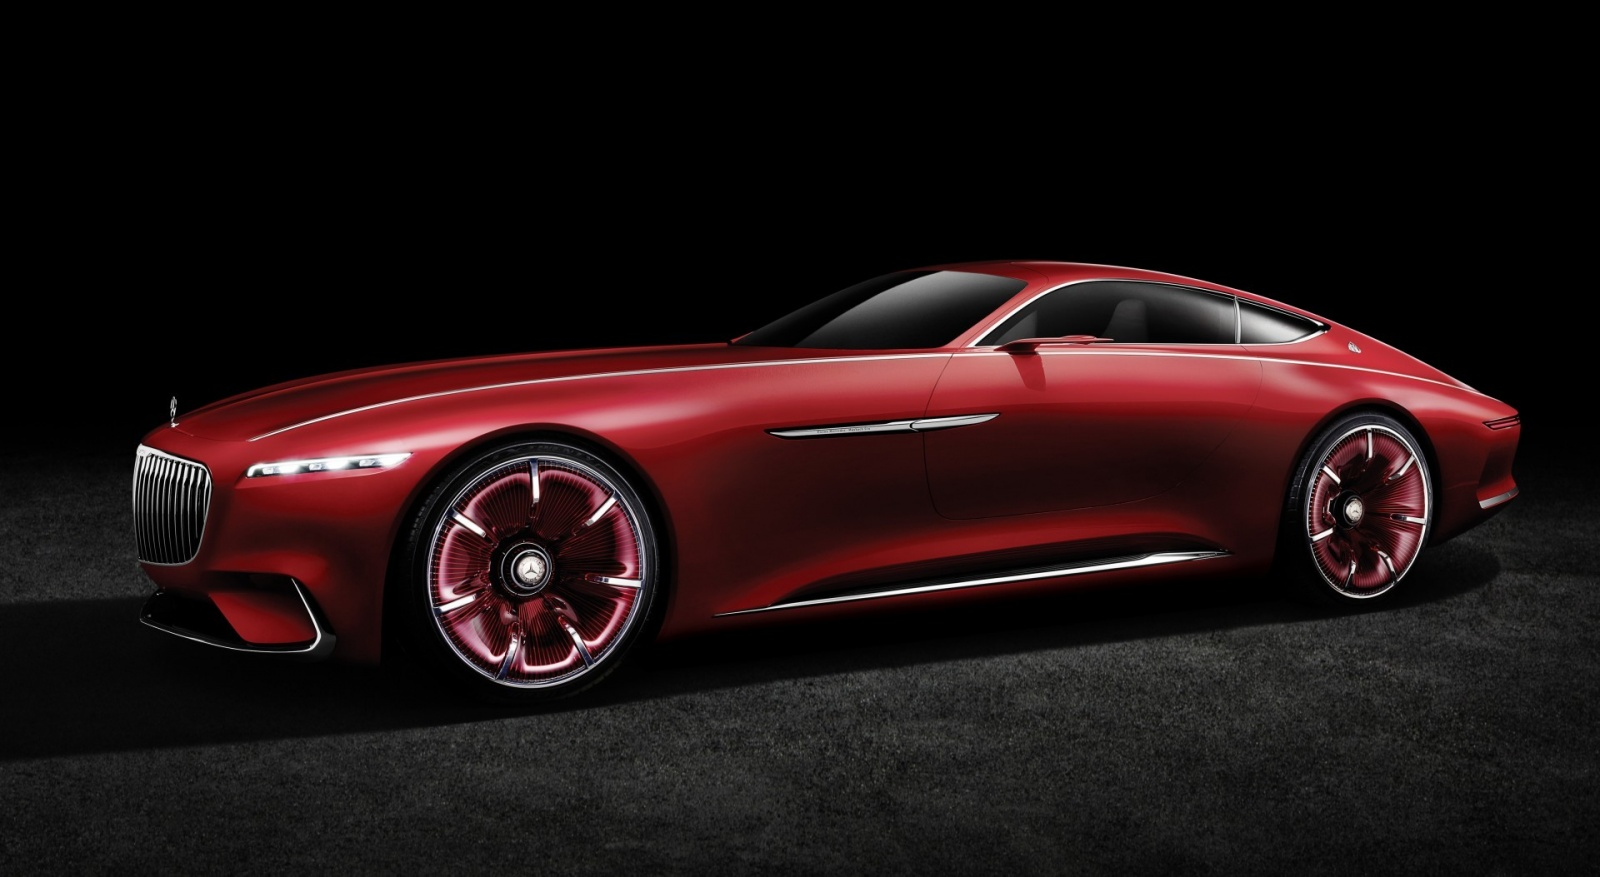 Проект шестиметрового электрокара Vision Mercedes-Maybach 6 - 2